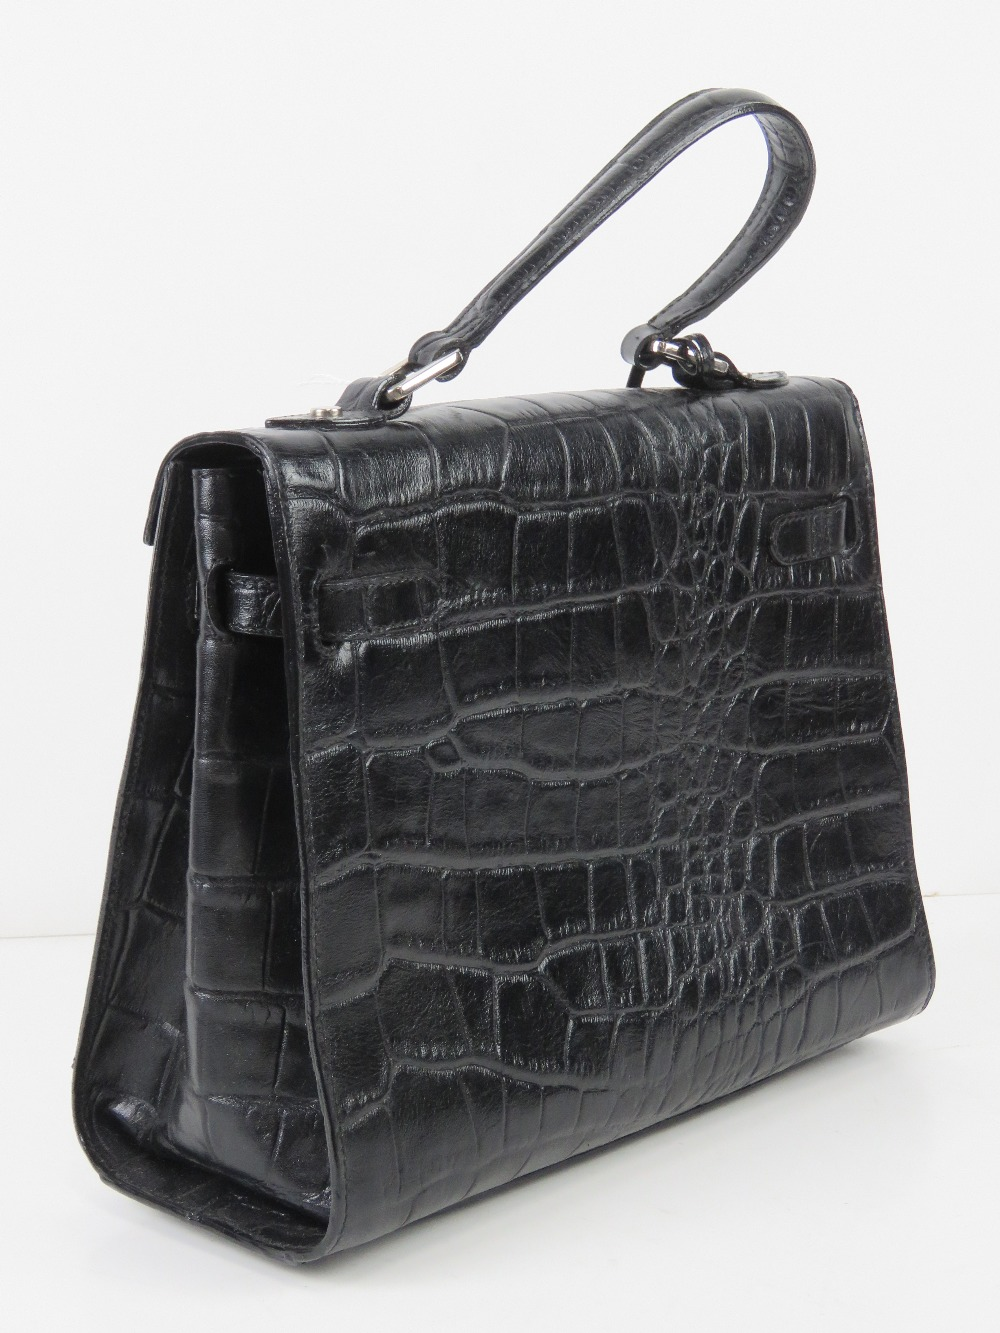 A black faux crocodile skin handbag havi - Image 2 of 4